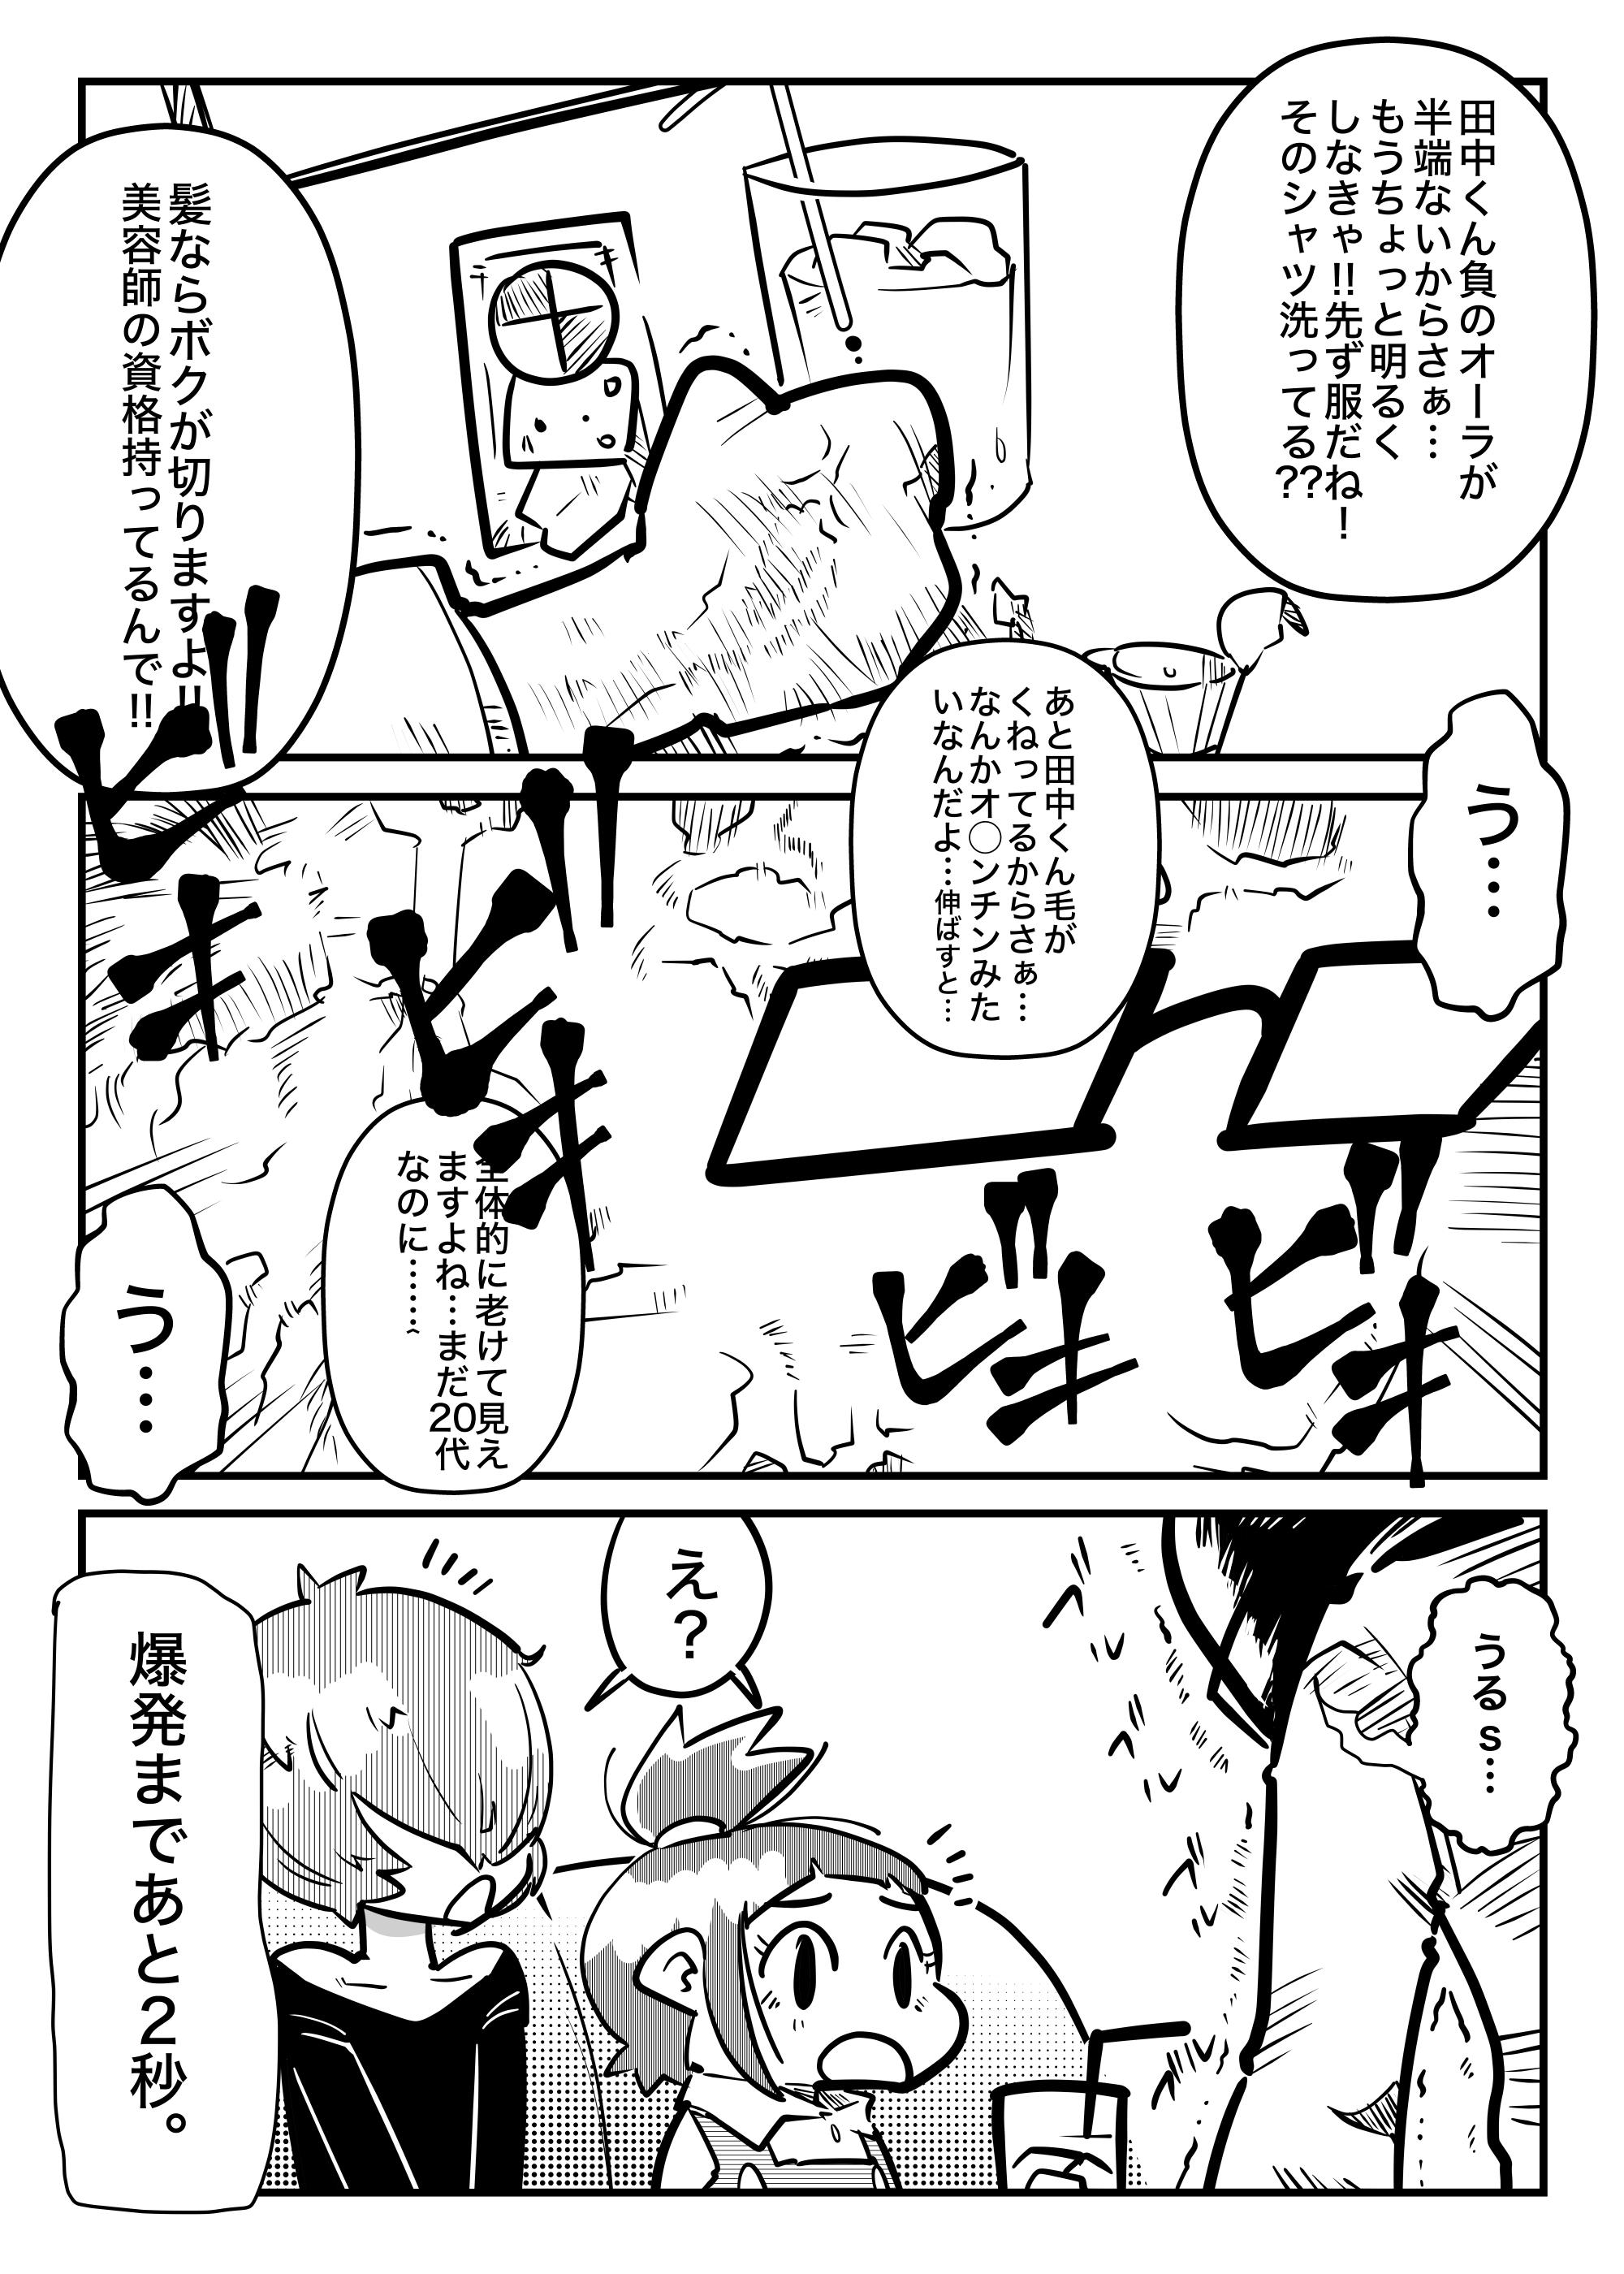 f:id:terashimaru117:20210909121907p:plain